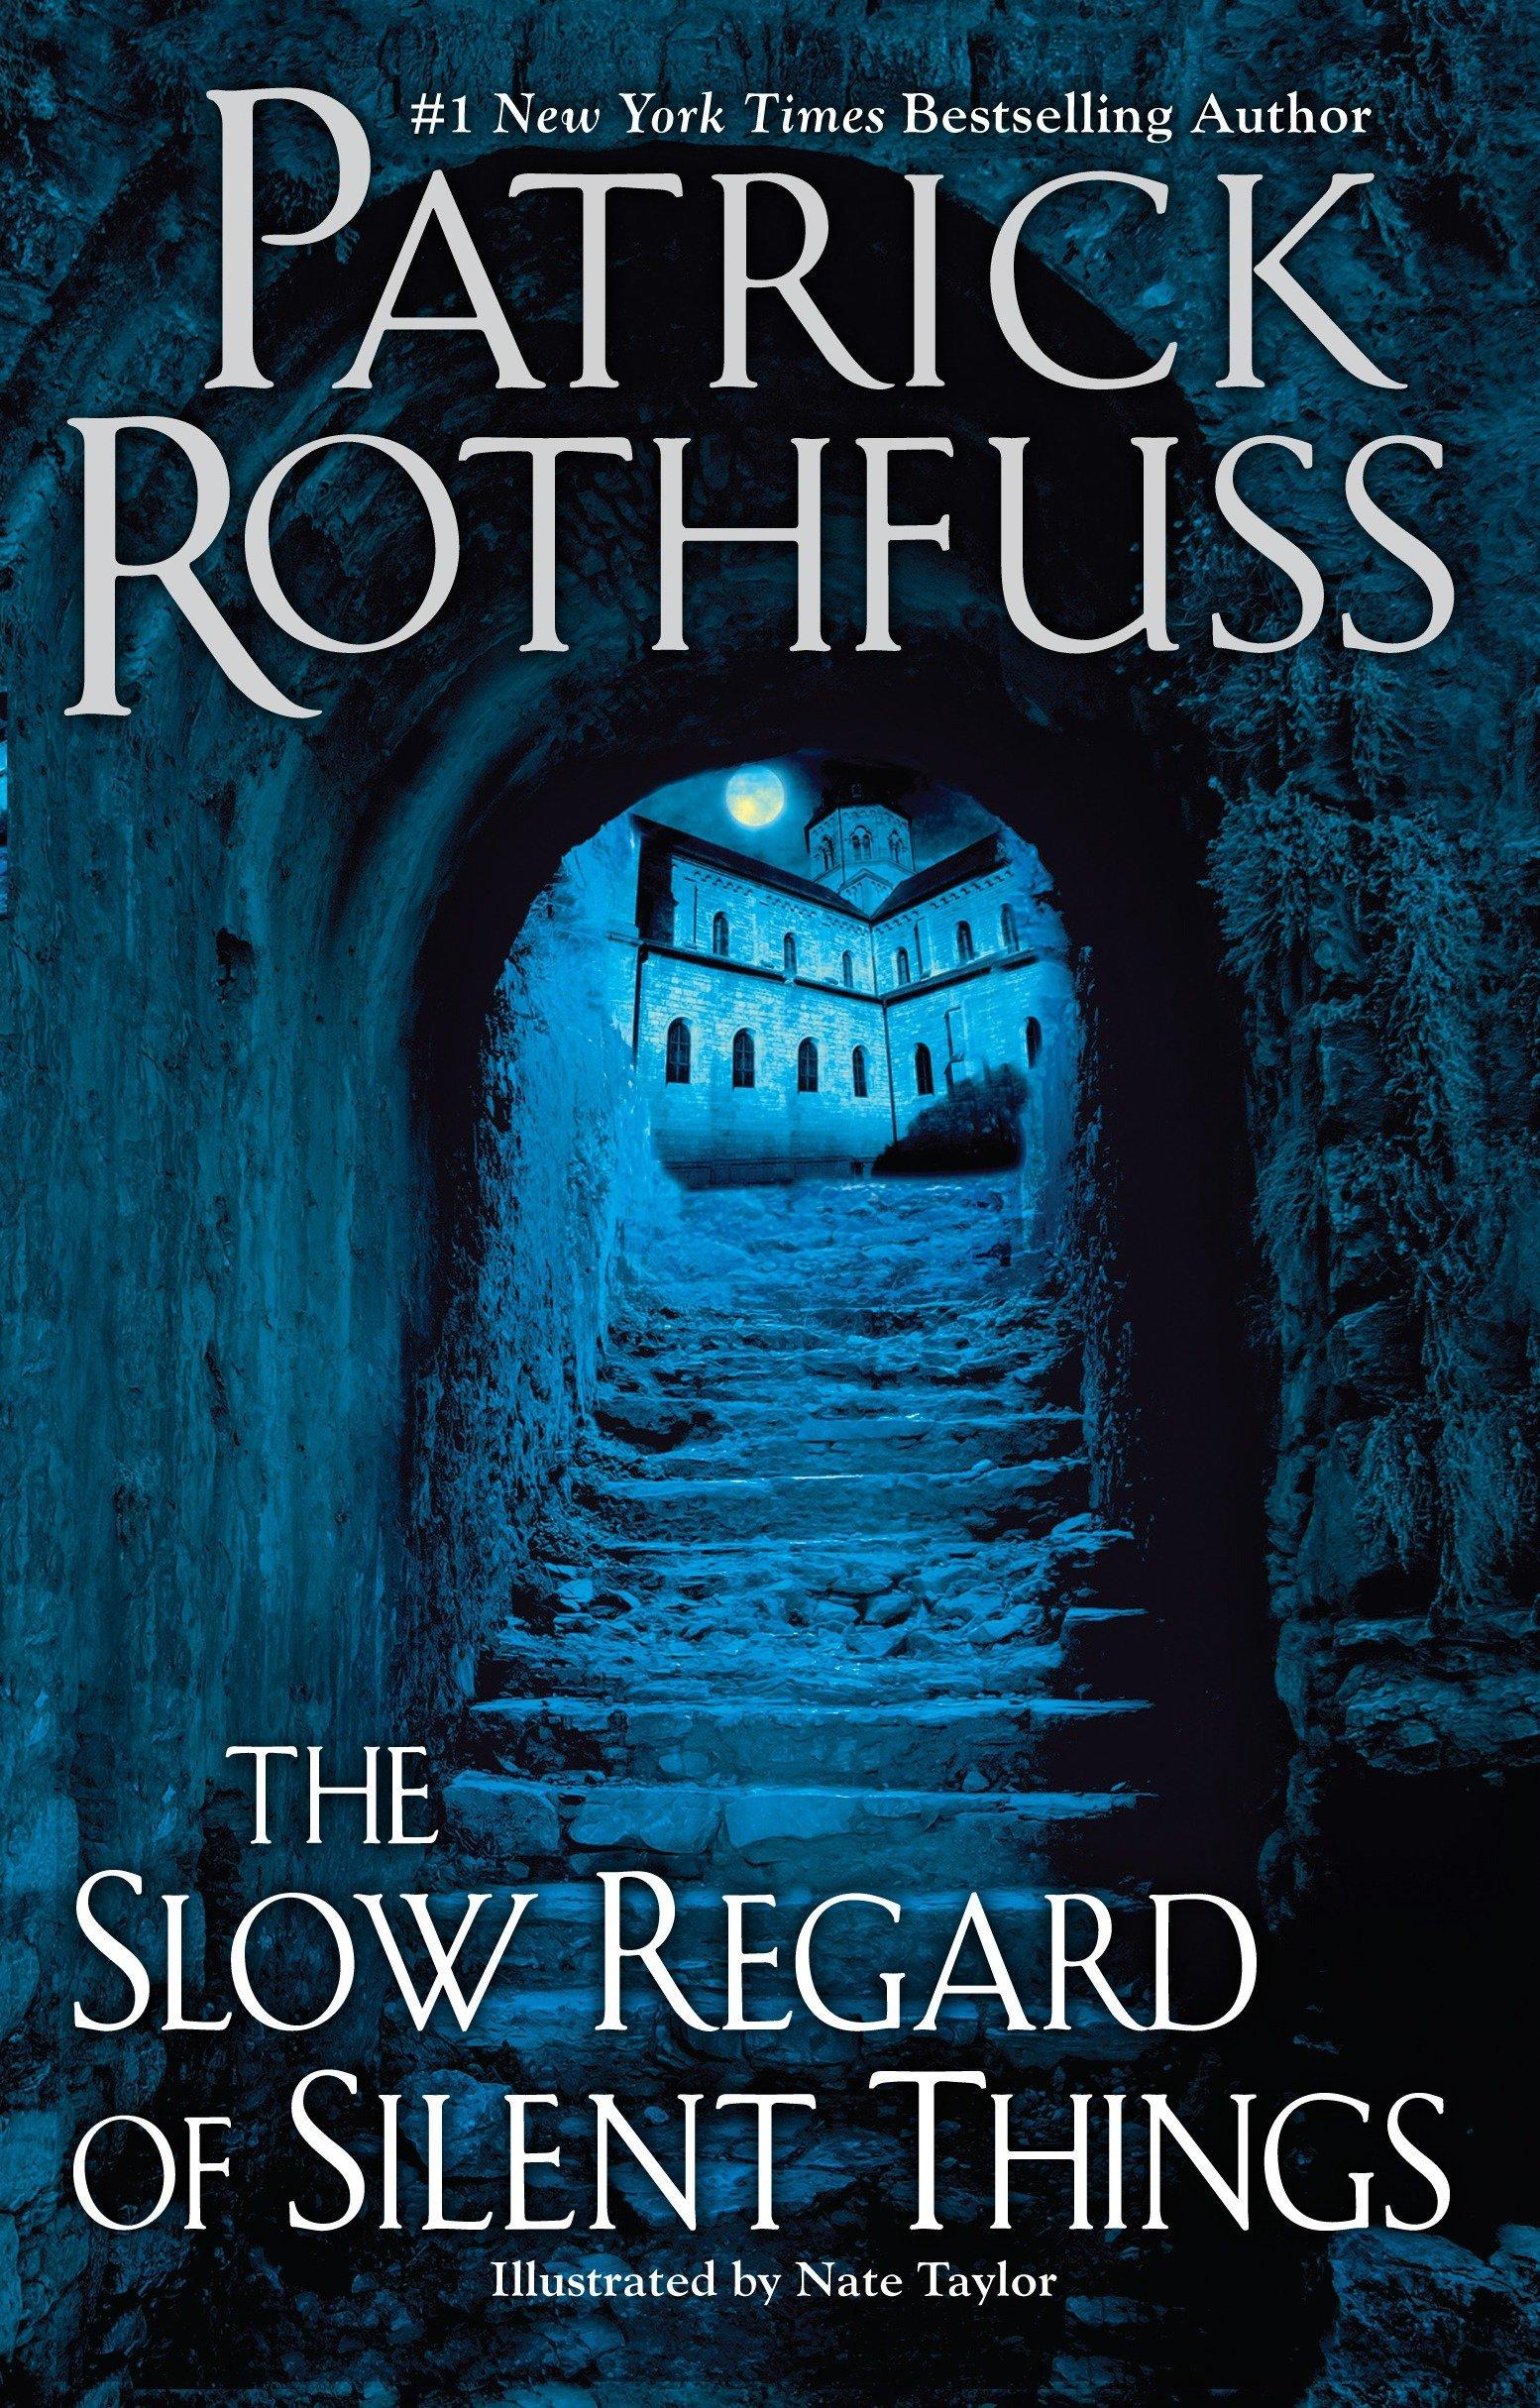 Rothfuss, SLOW REGARD OF SILENT THINGS, US cover.jpg